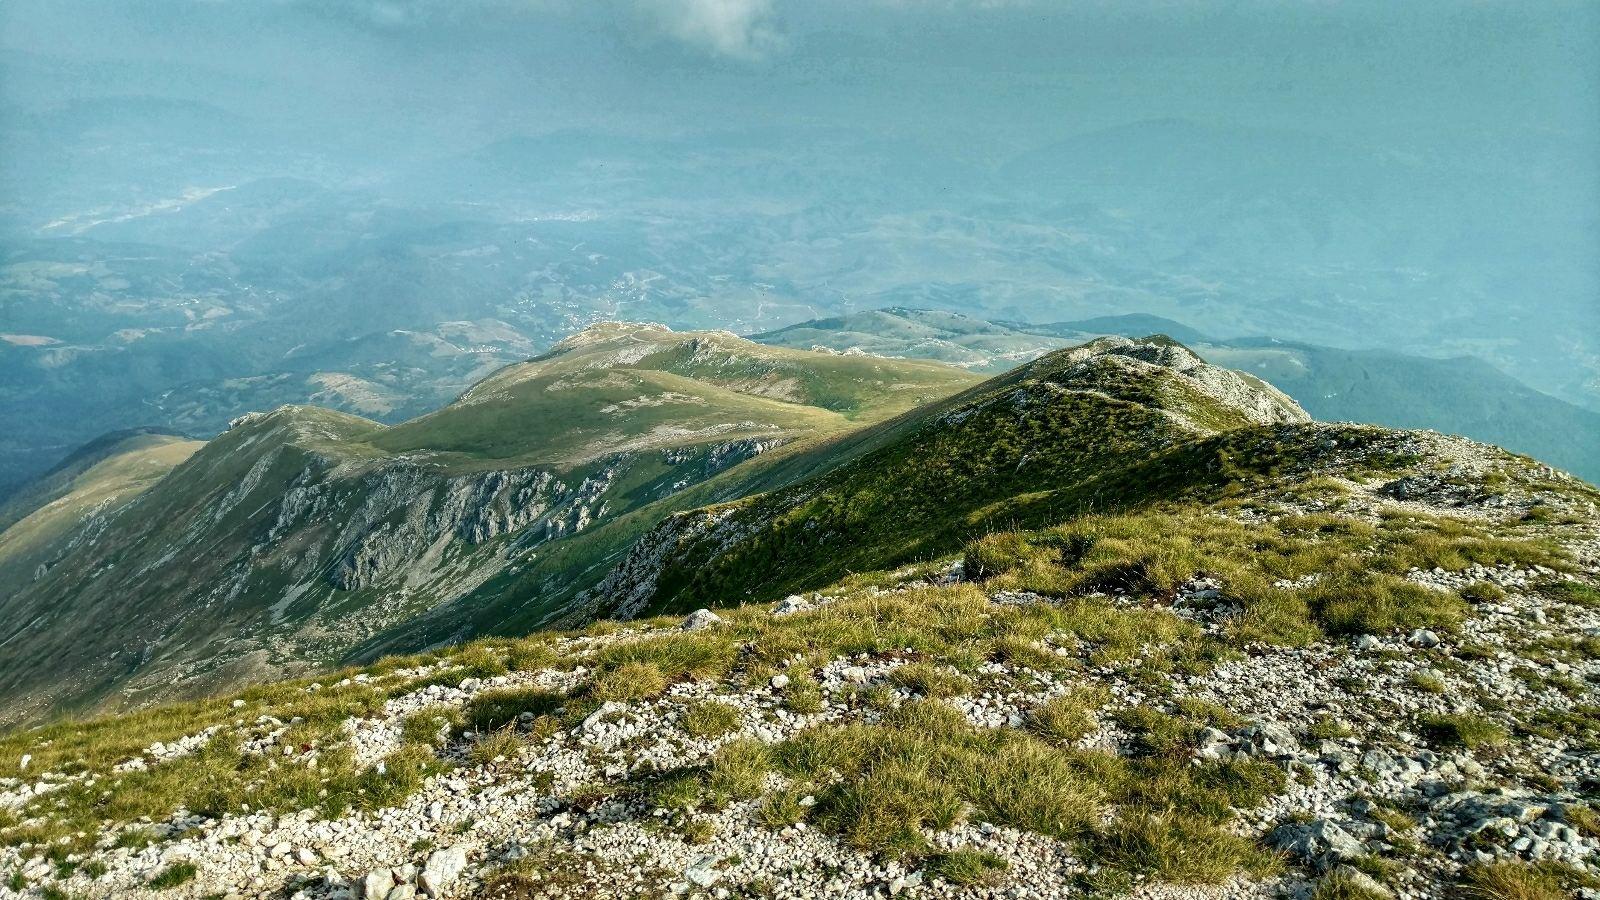 Hikingtrail on Ljuboten Mountain